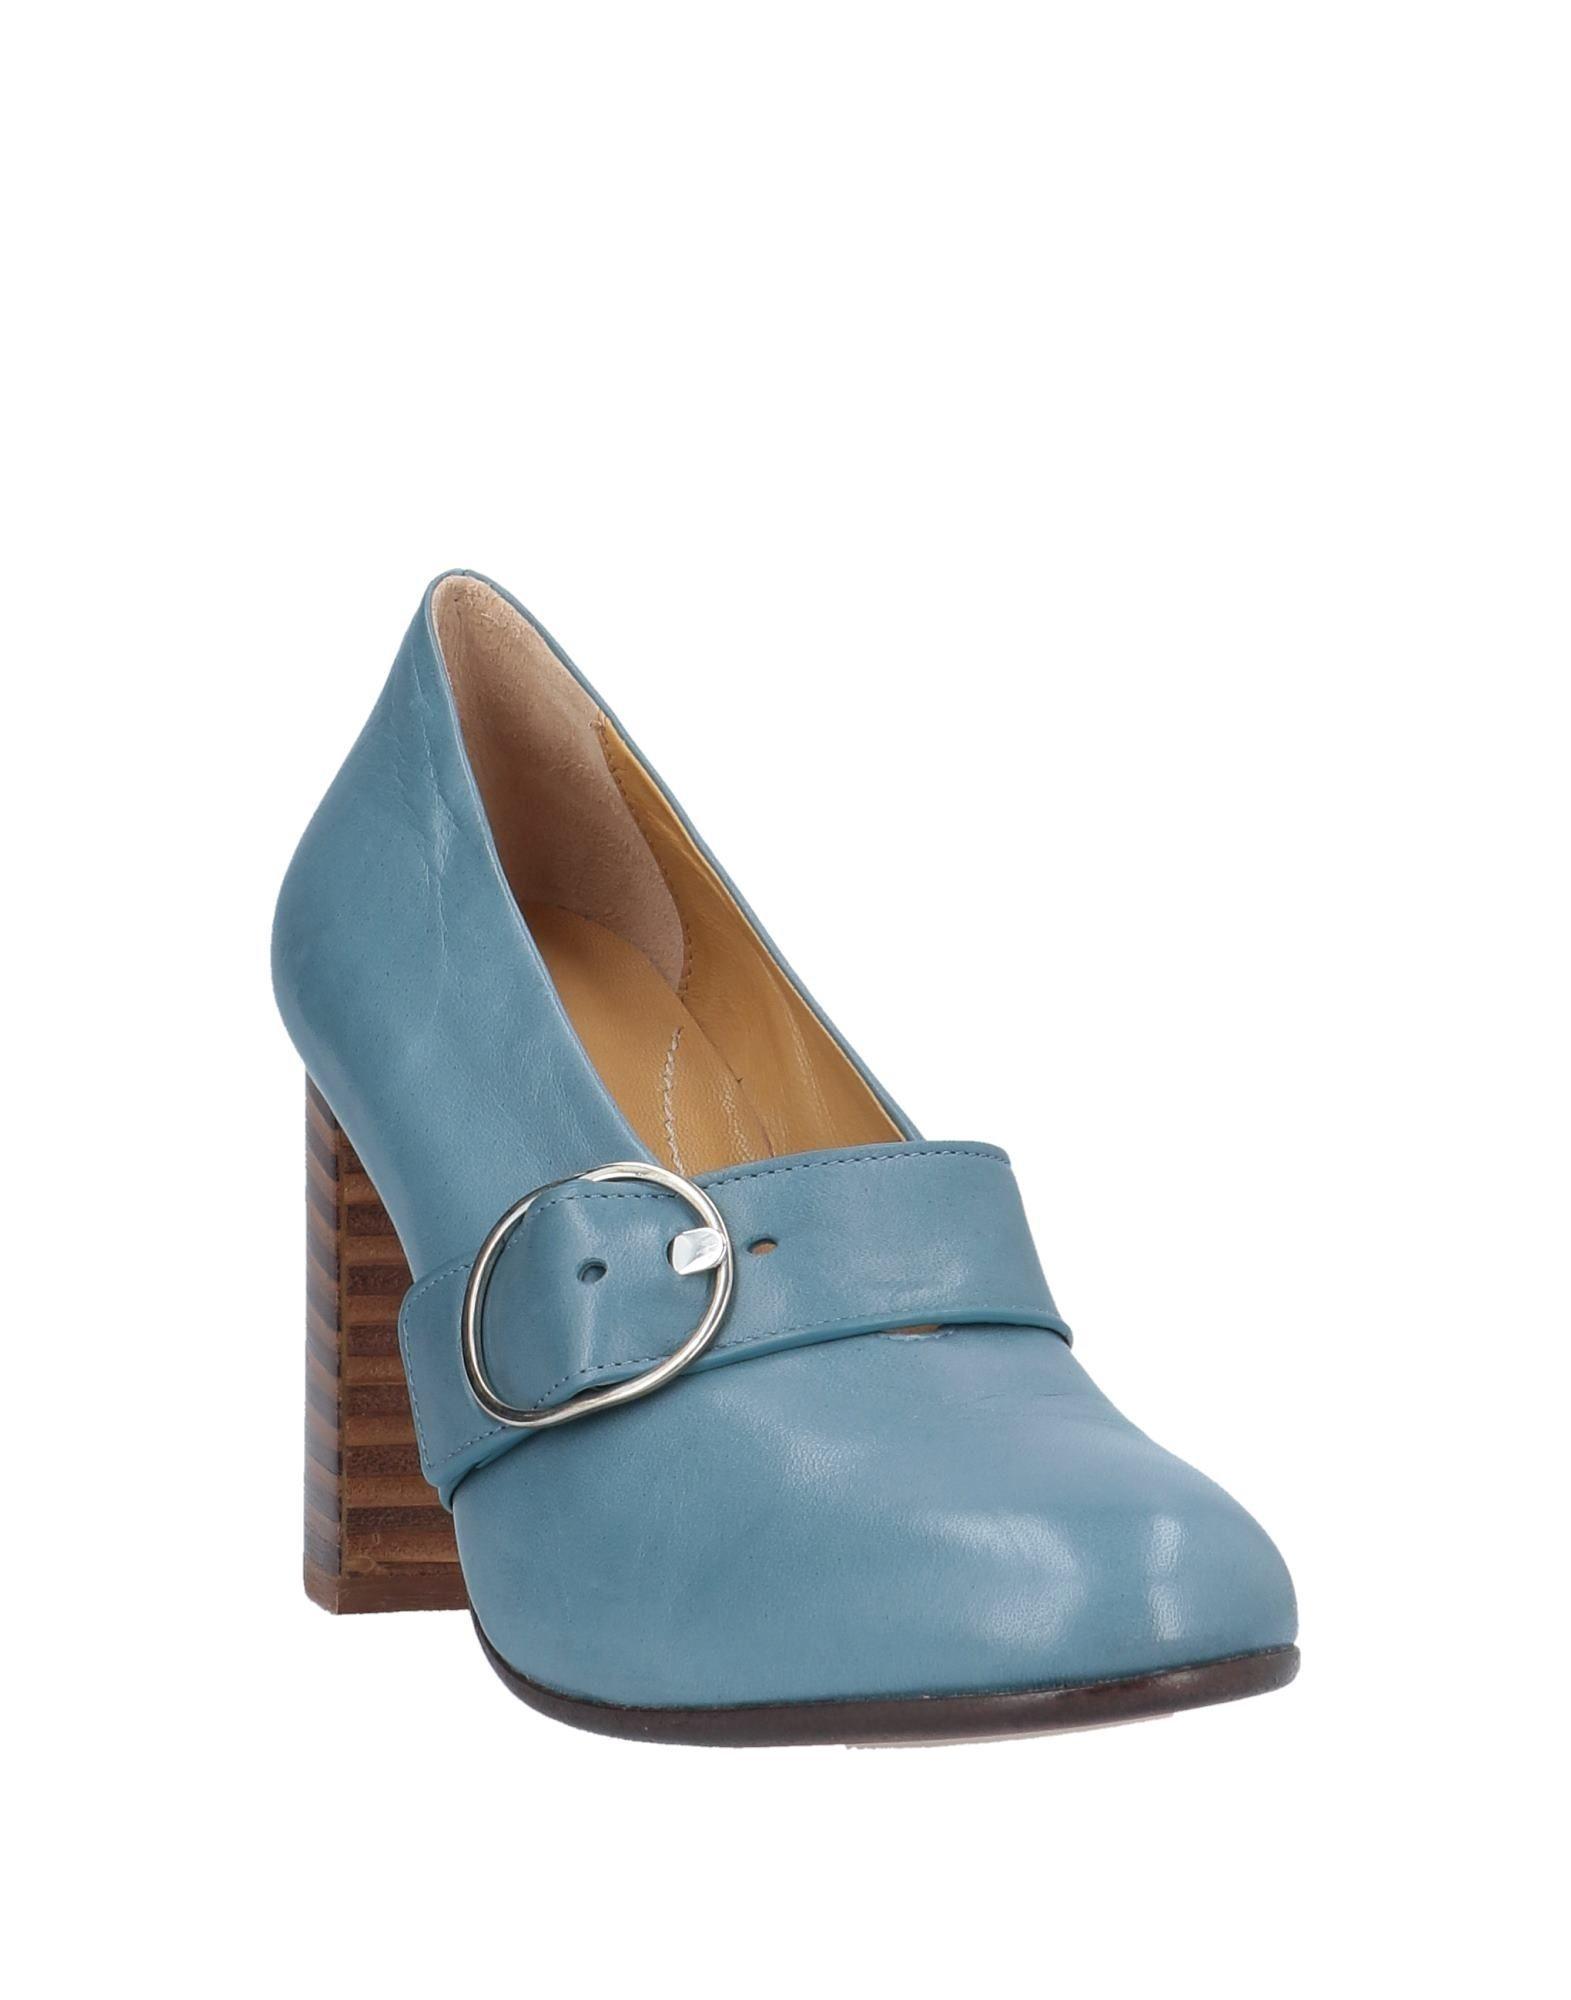 Zapatos de salón Pomme D'or de Cuero de color Azul